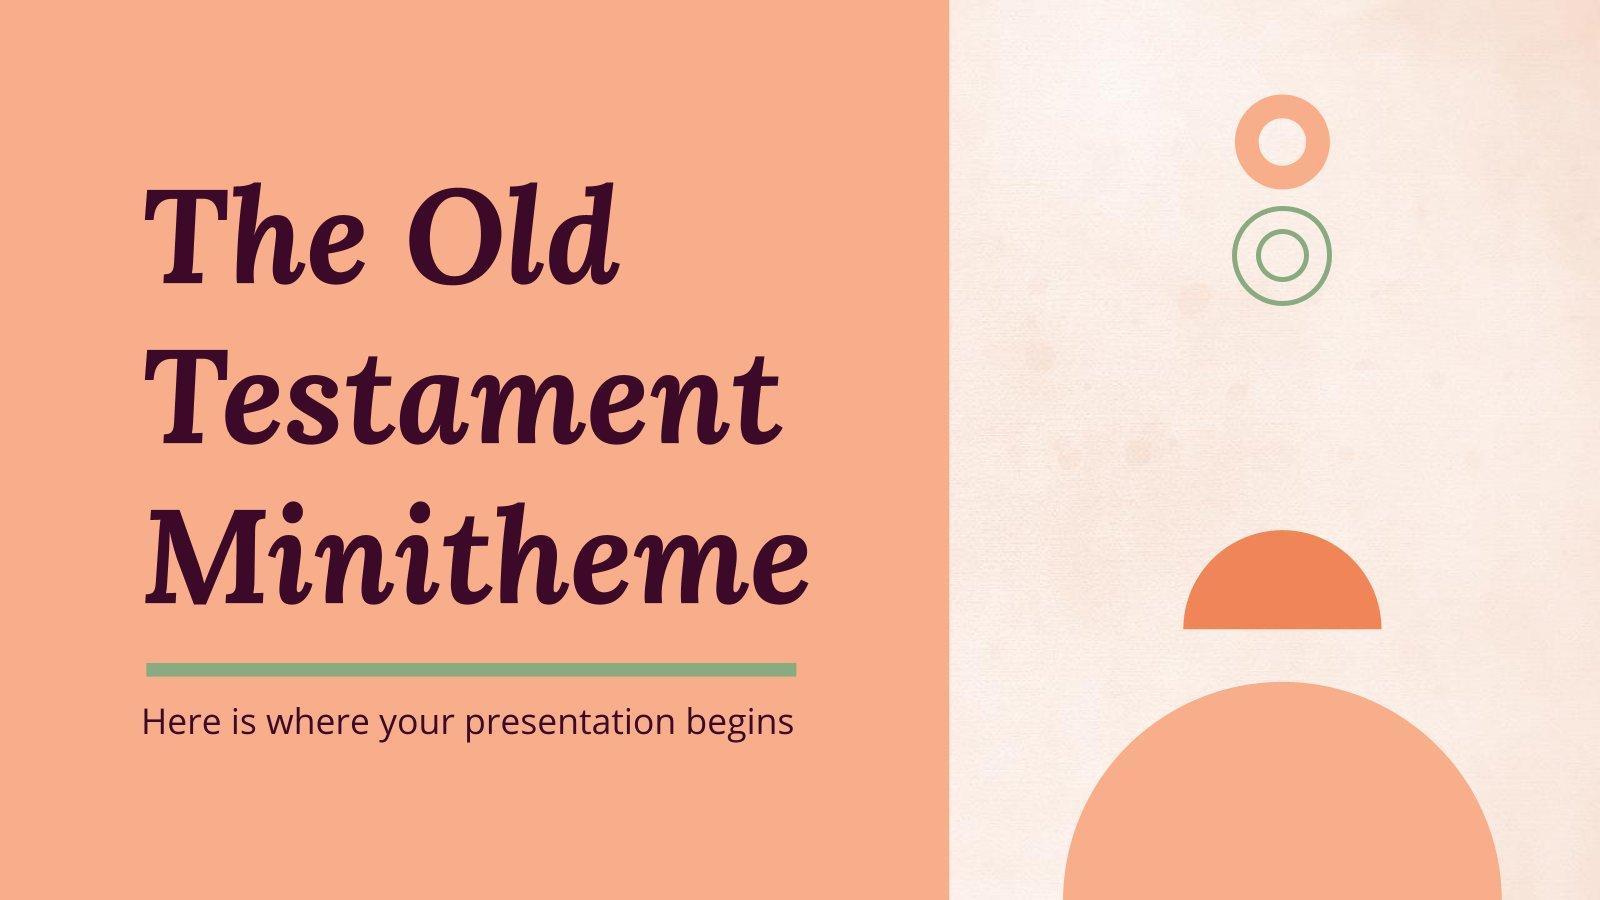 The Old Testament Minitheme presentation template